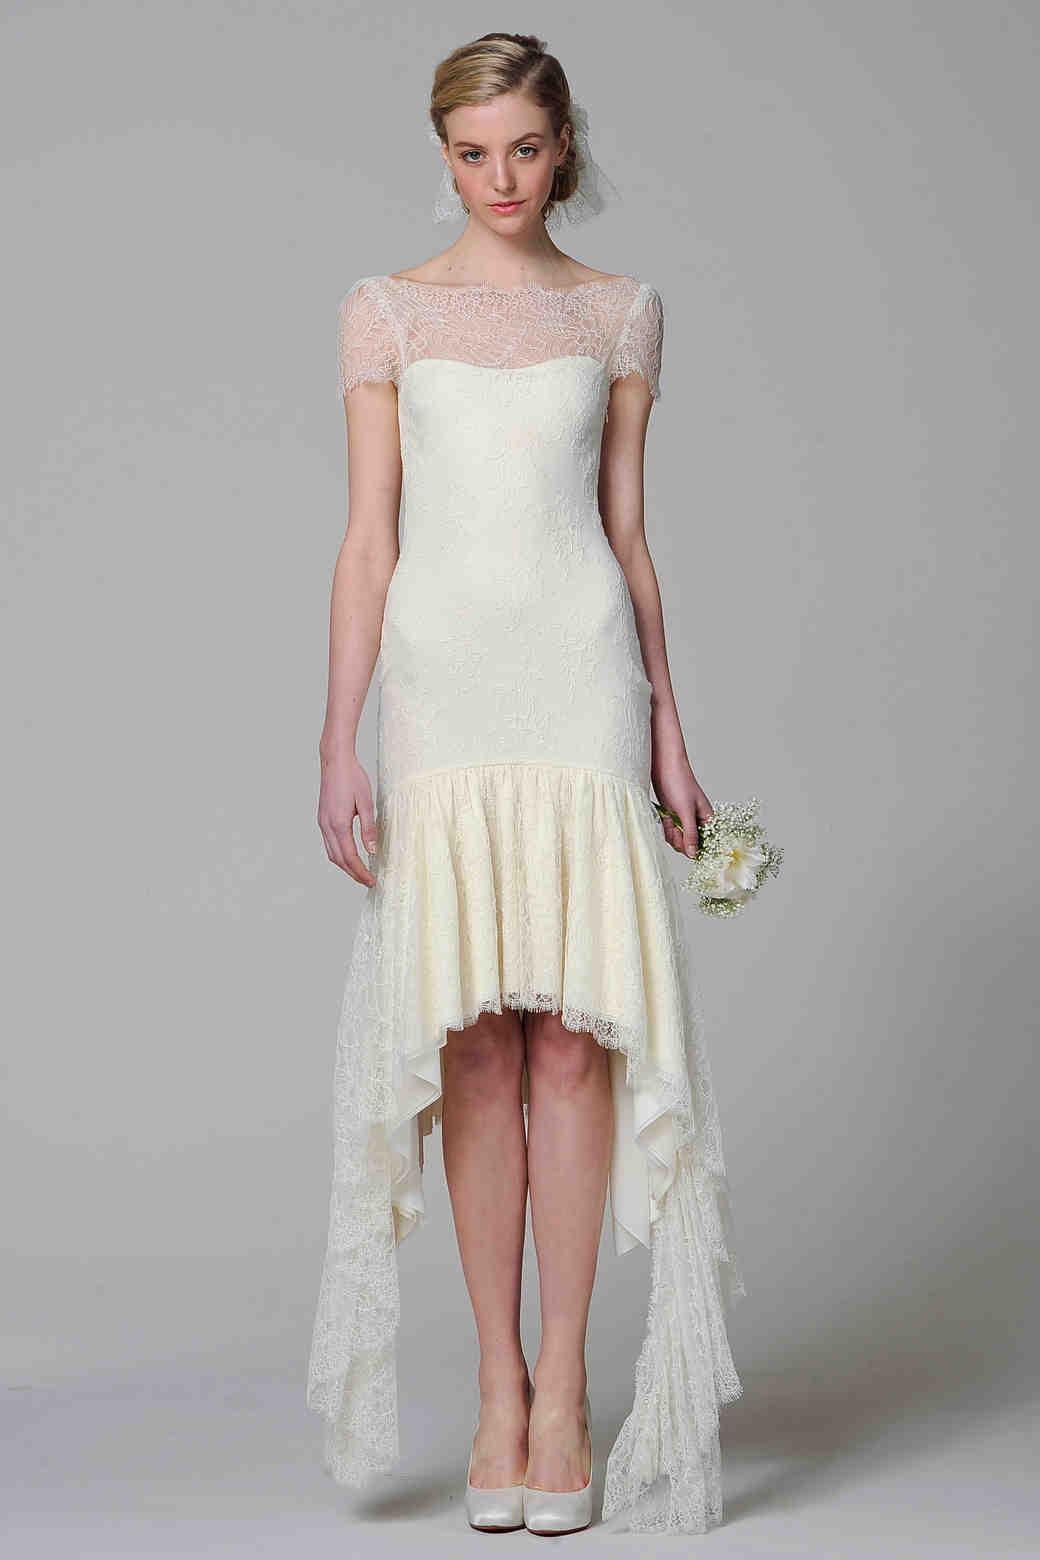 Short Wedding Dresses from Spring 2013 Bridal Fashion Week ...